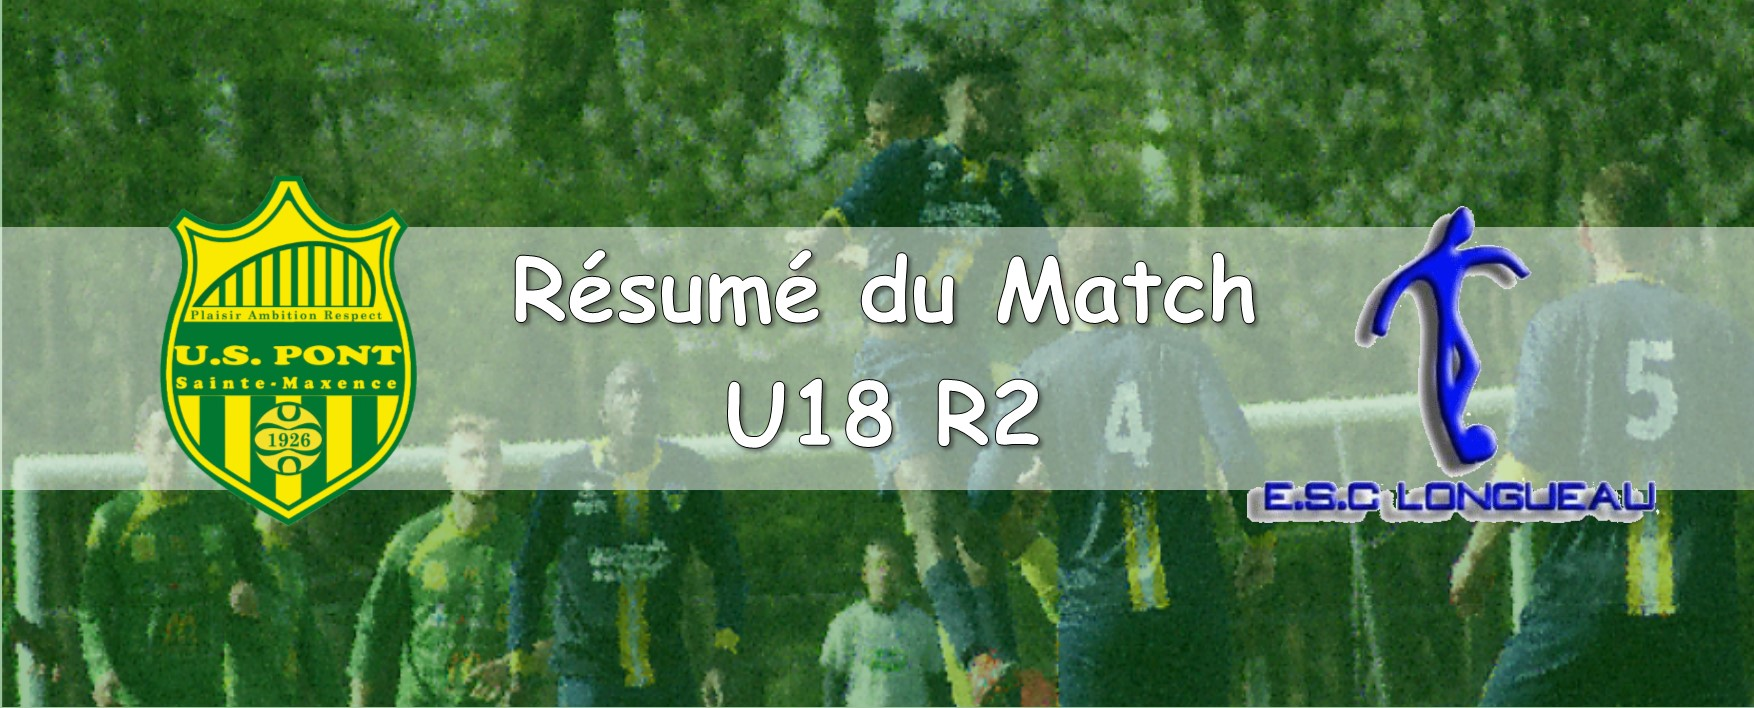 r u00e9sum u00e9 match  u2013 uspontfootball